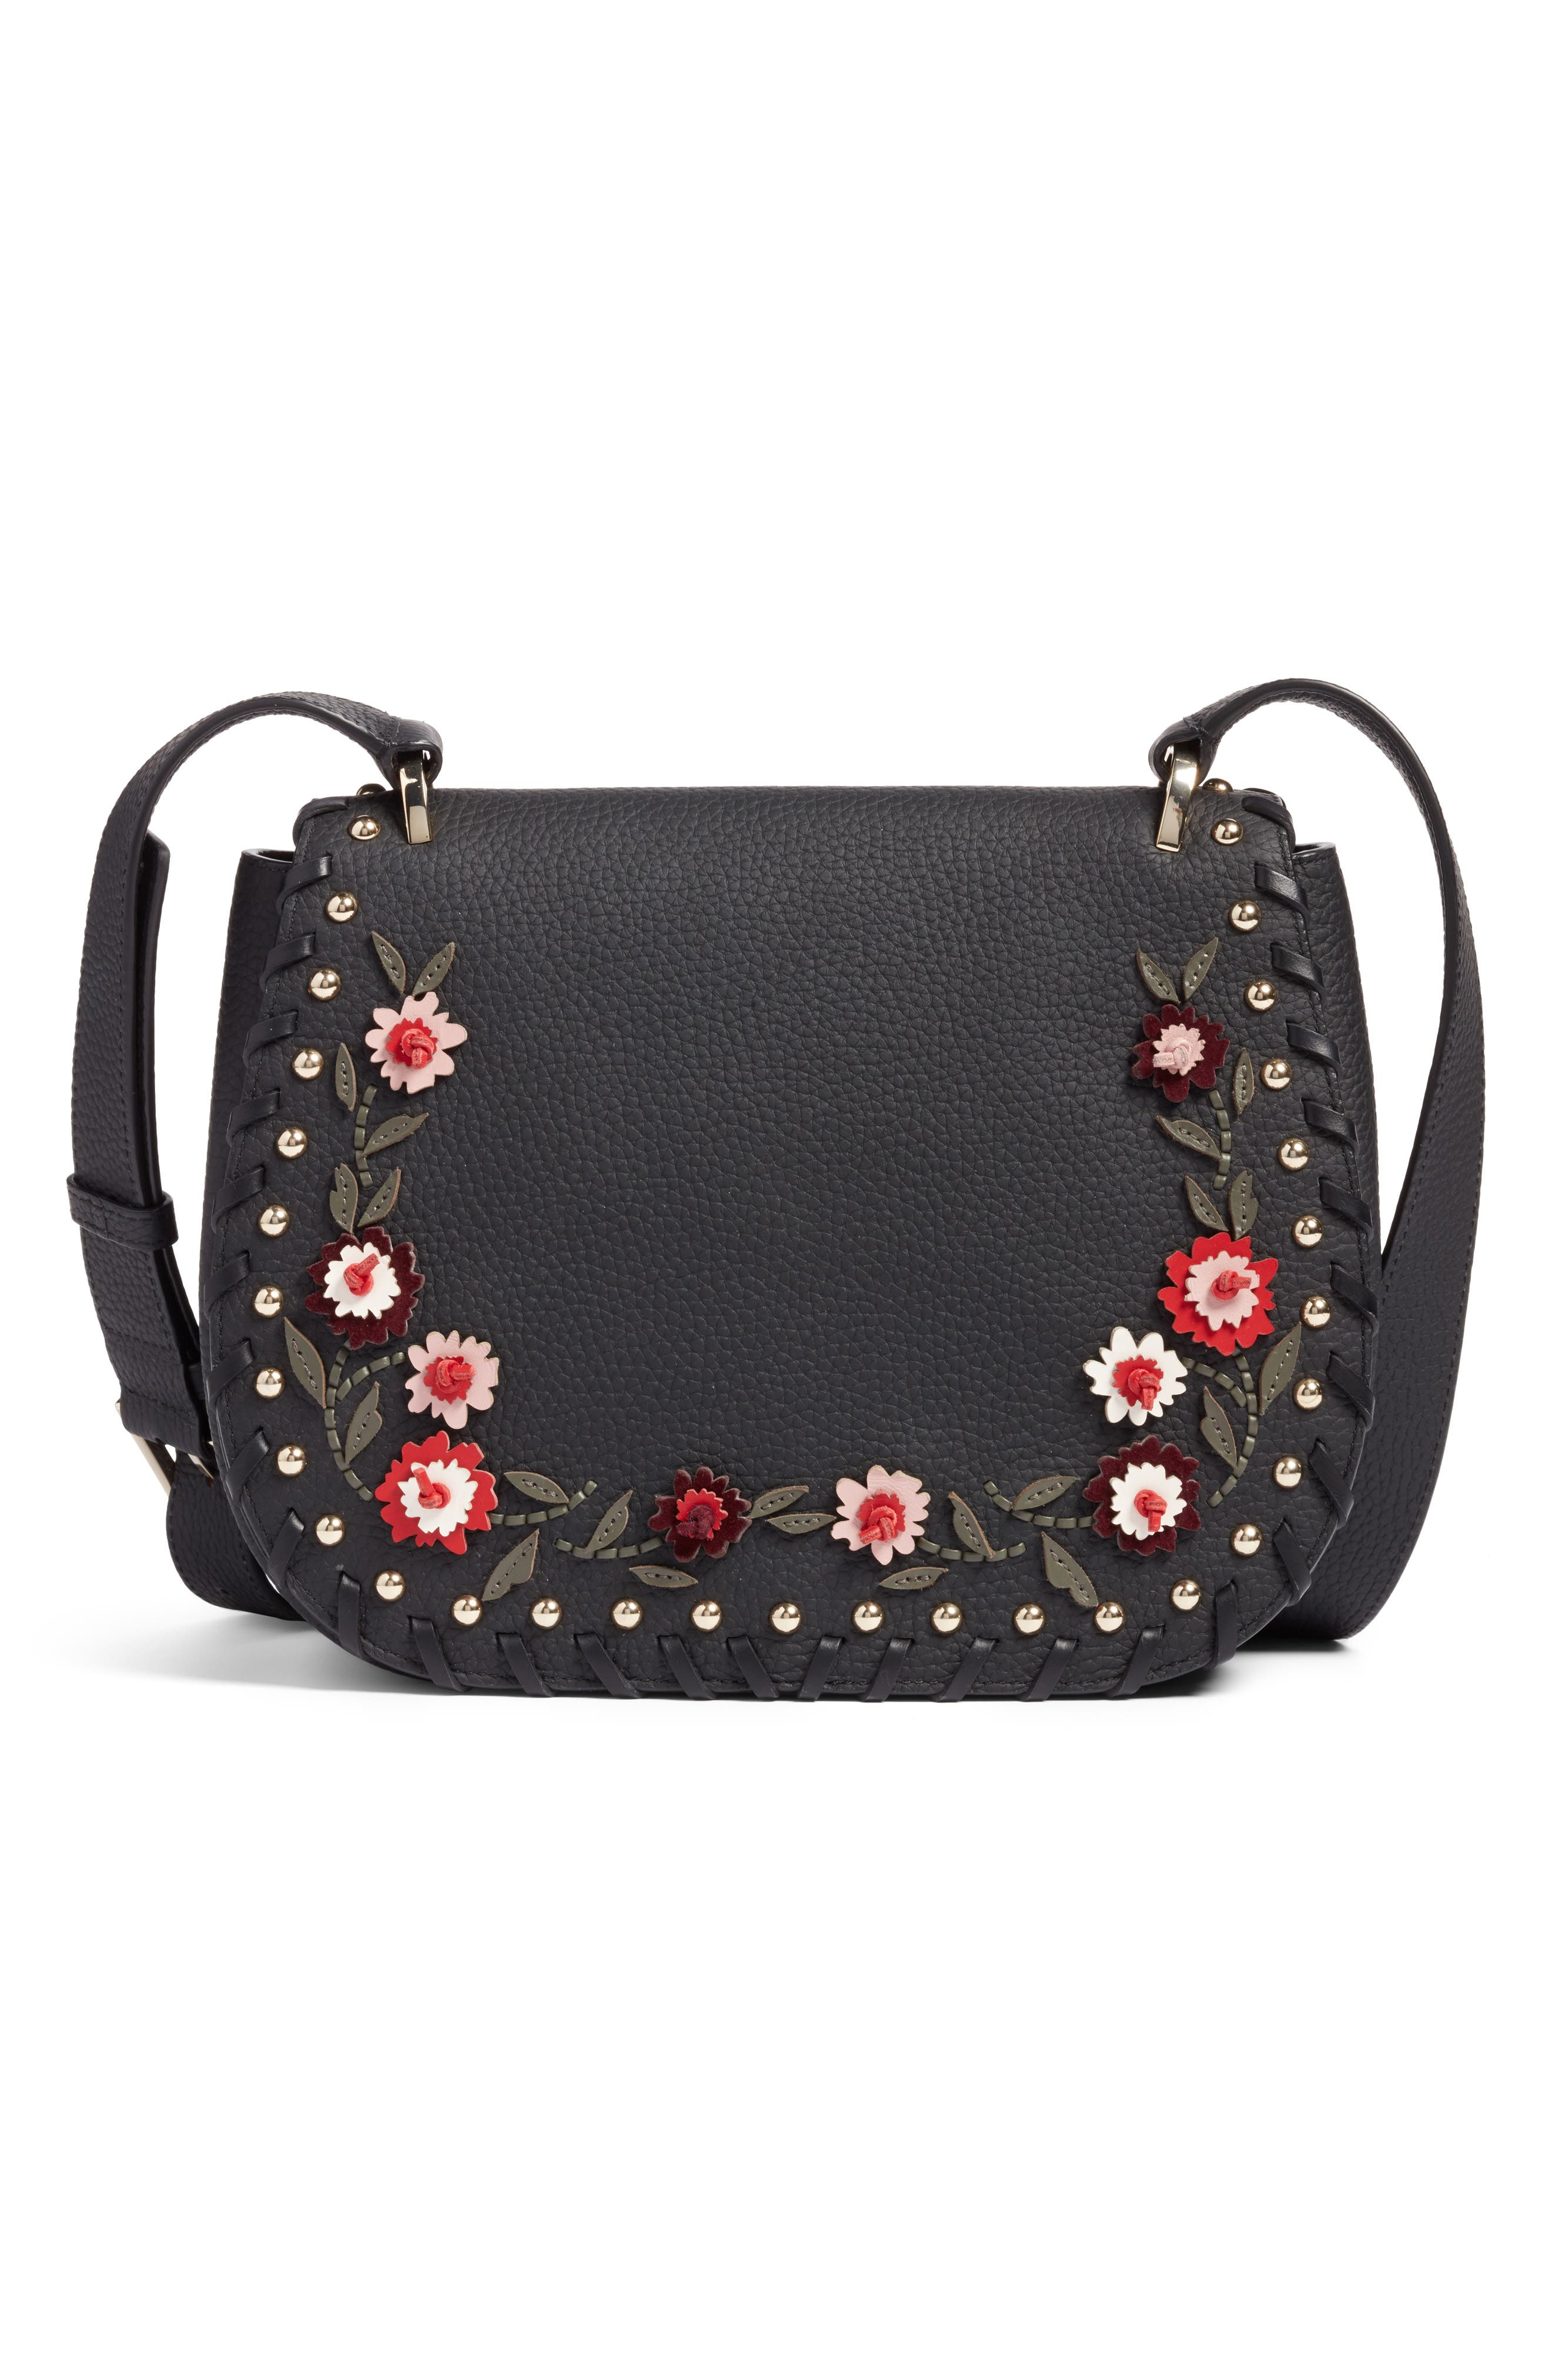 madison daniels drive - tressa embellished leather crossbody bag,                             Main thumbnail 1, color,                             001